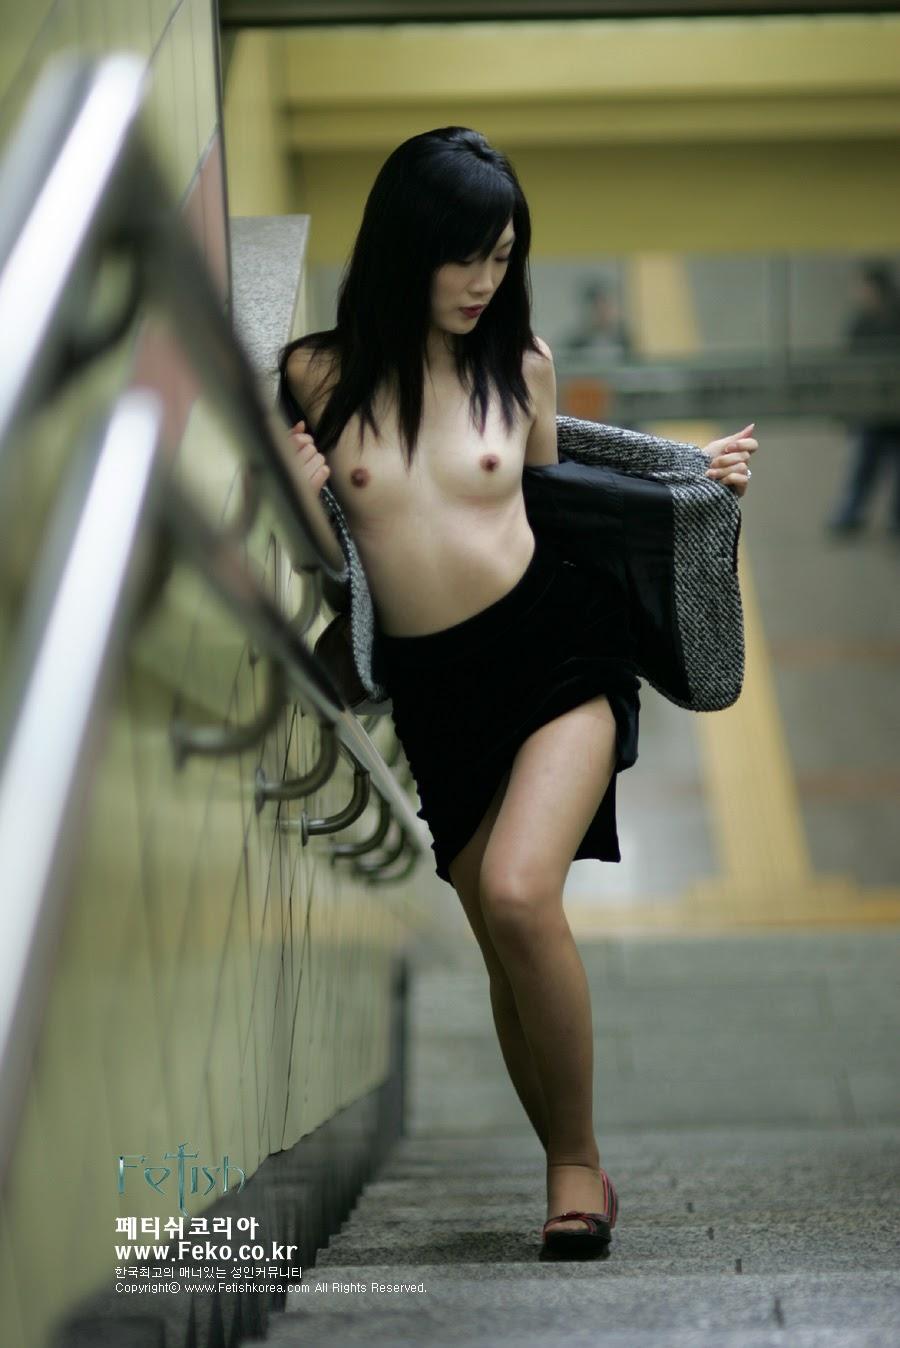 Fetishkorea.MD189.rar